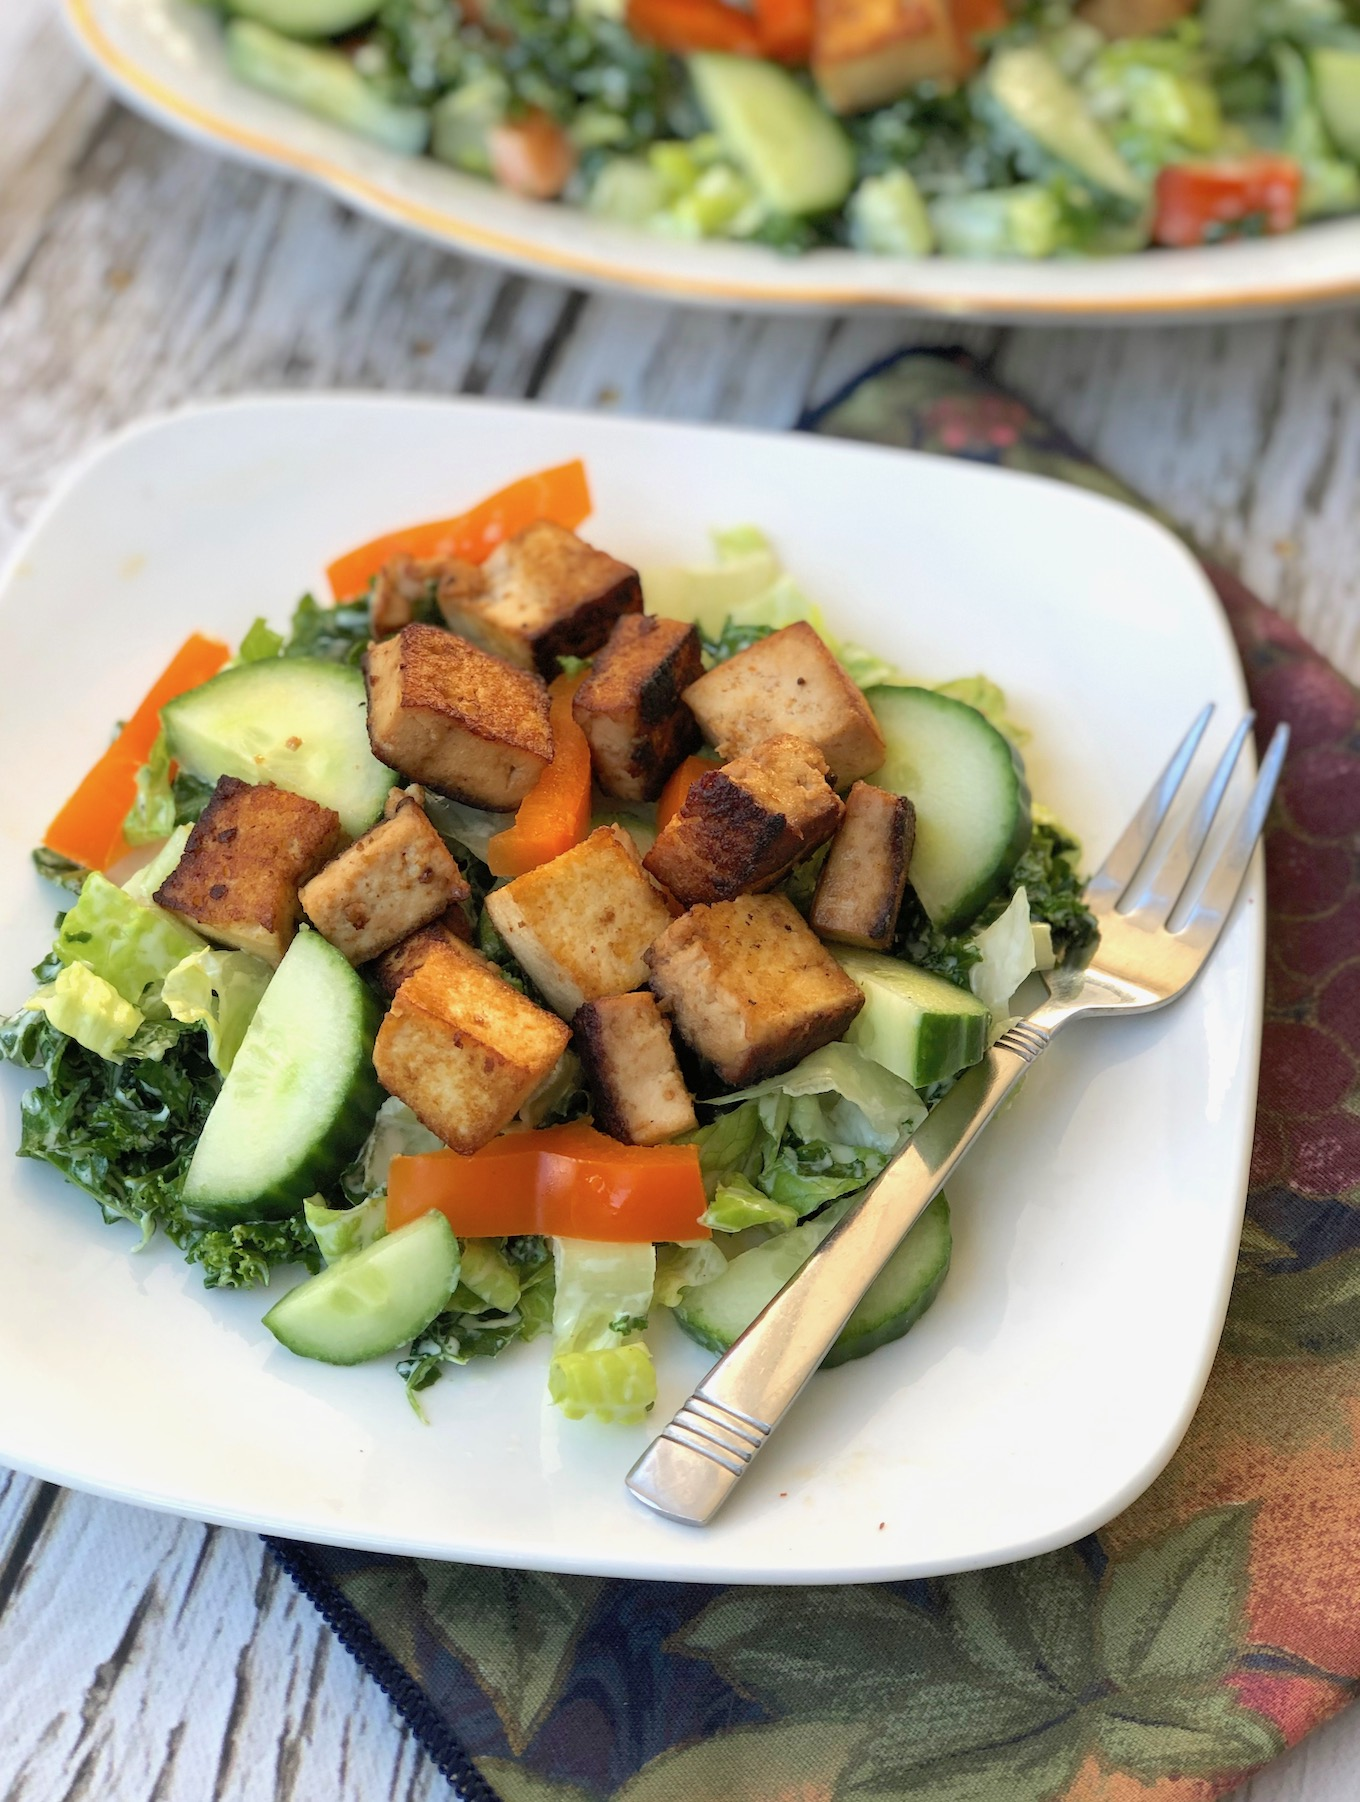 Kale & Cucumber Salad with Tofu